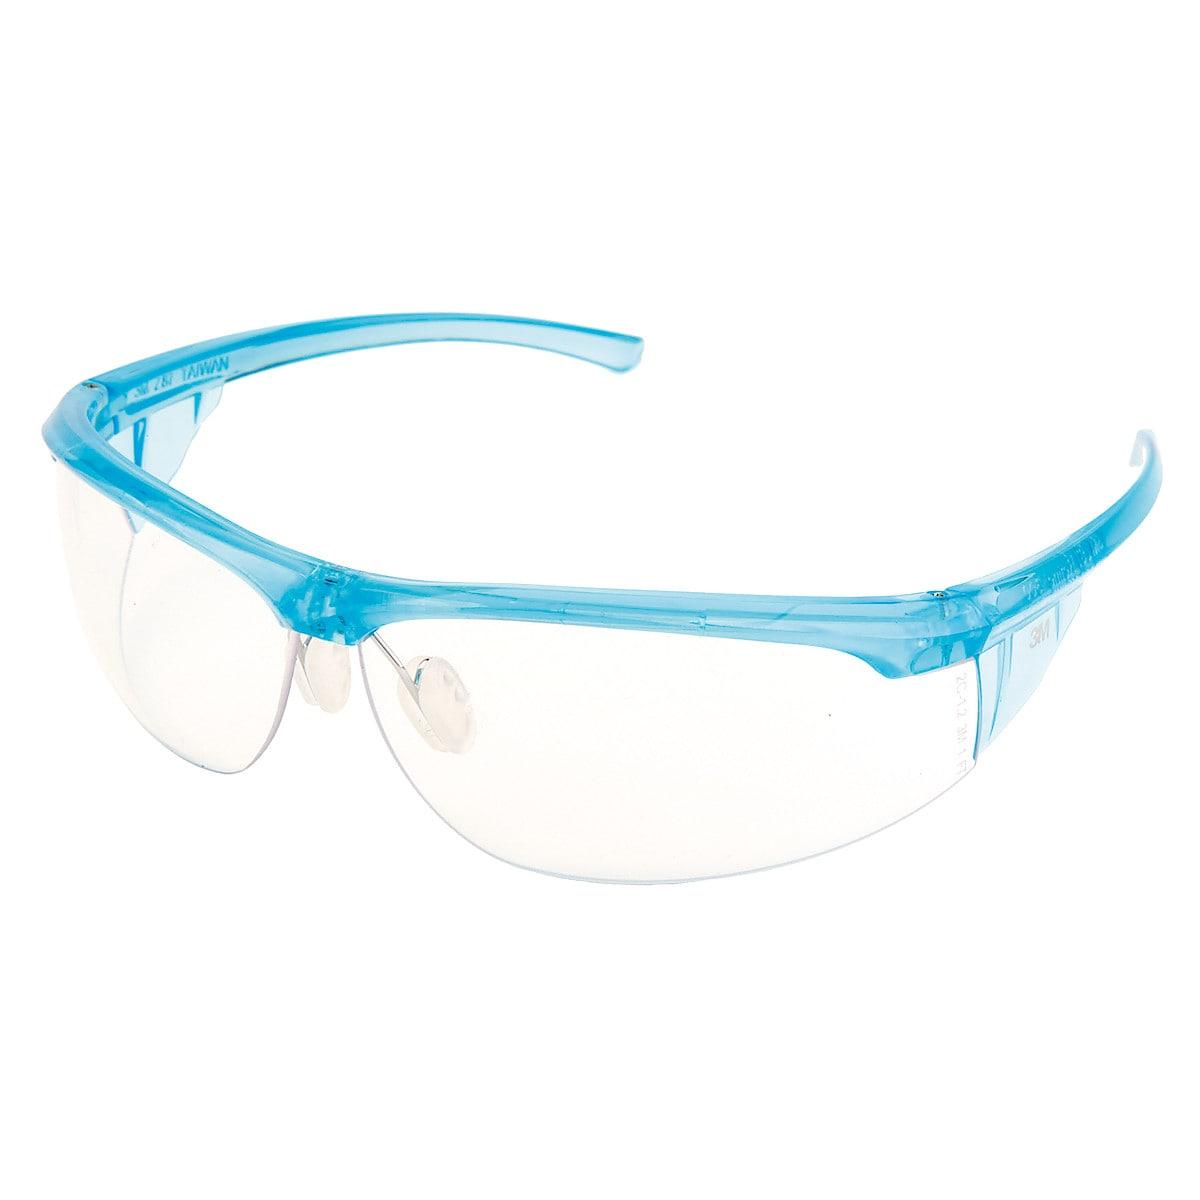 3M Refine Lady's/Child's Safety Glasses